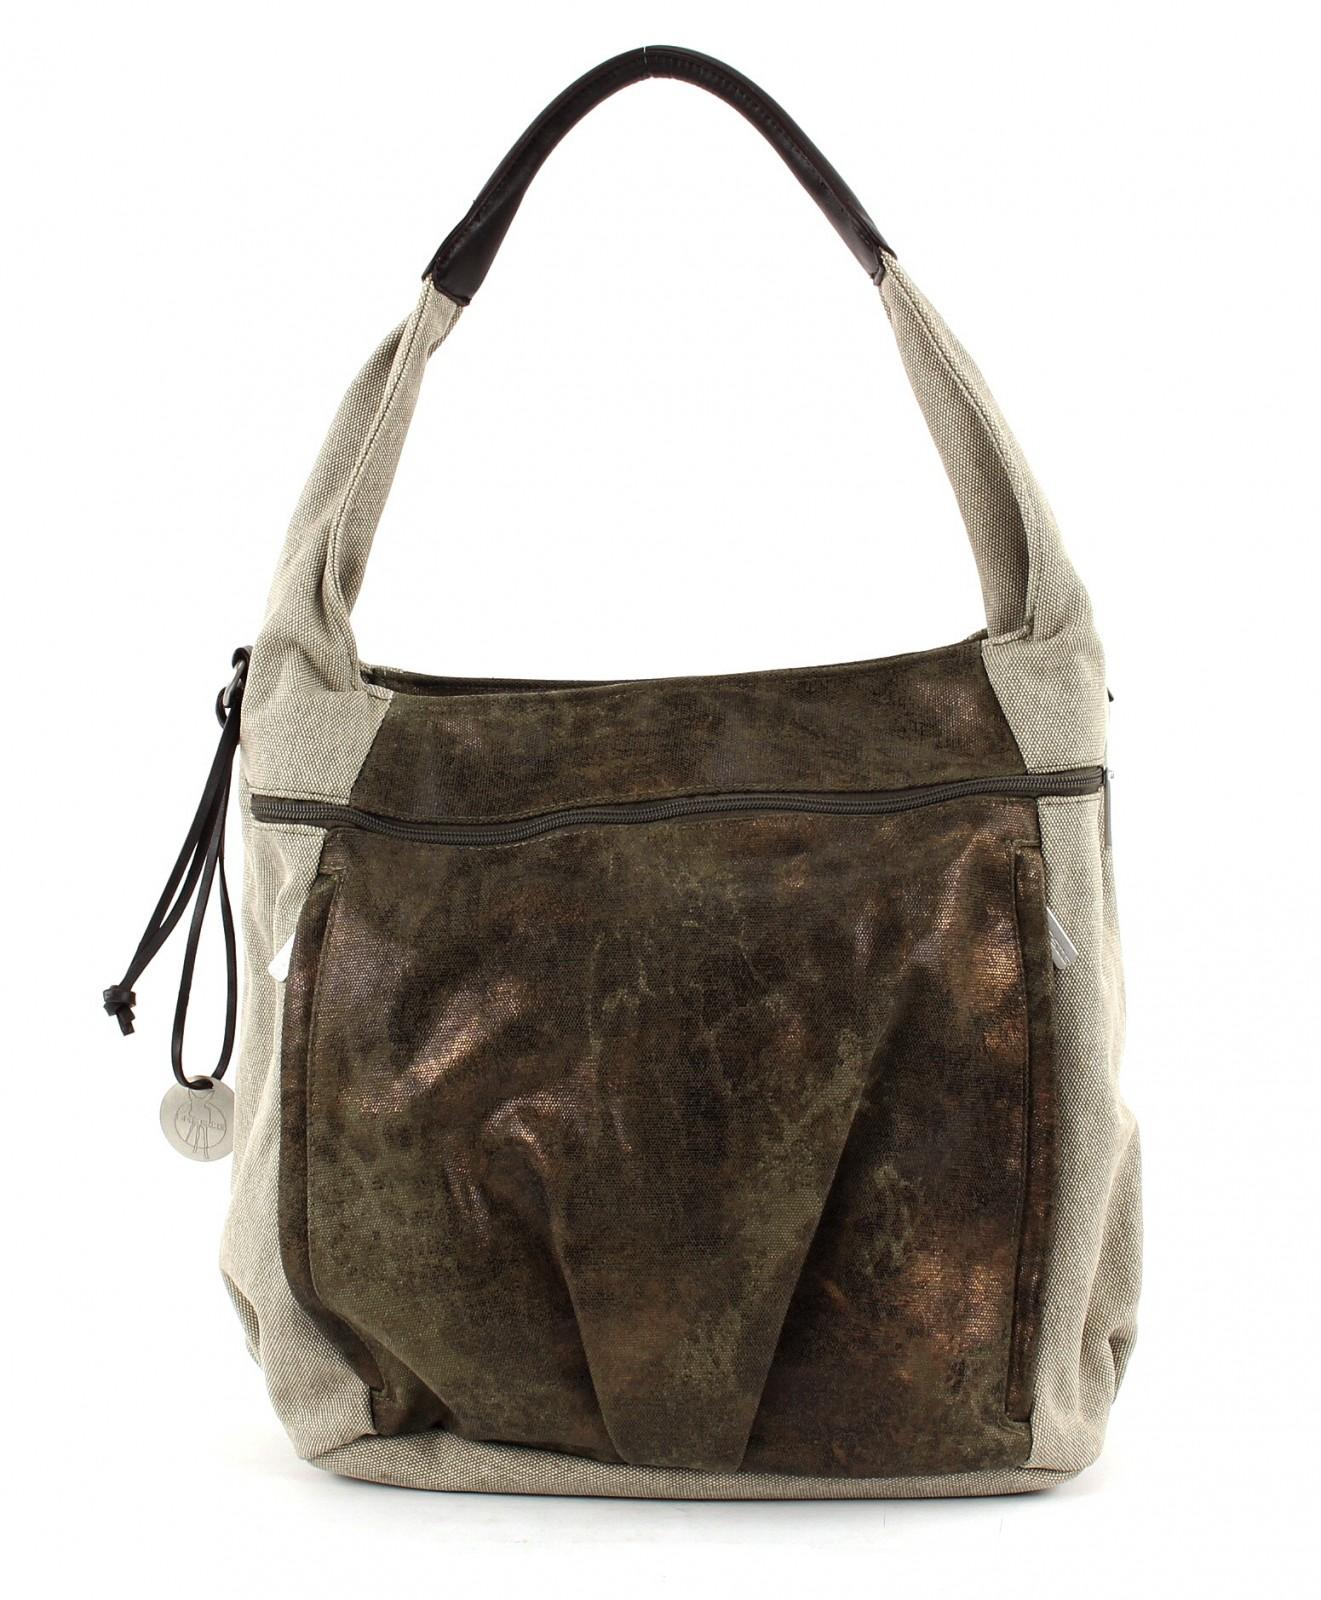 Lässig Diaper Bag Casual Hobo Olive-Beige